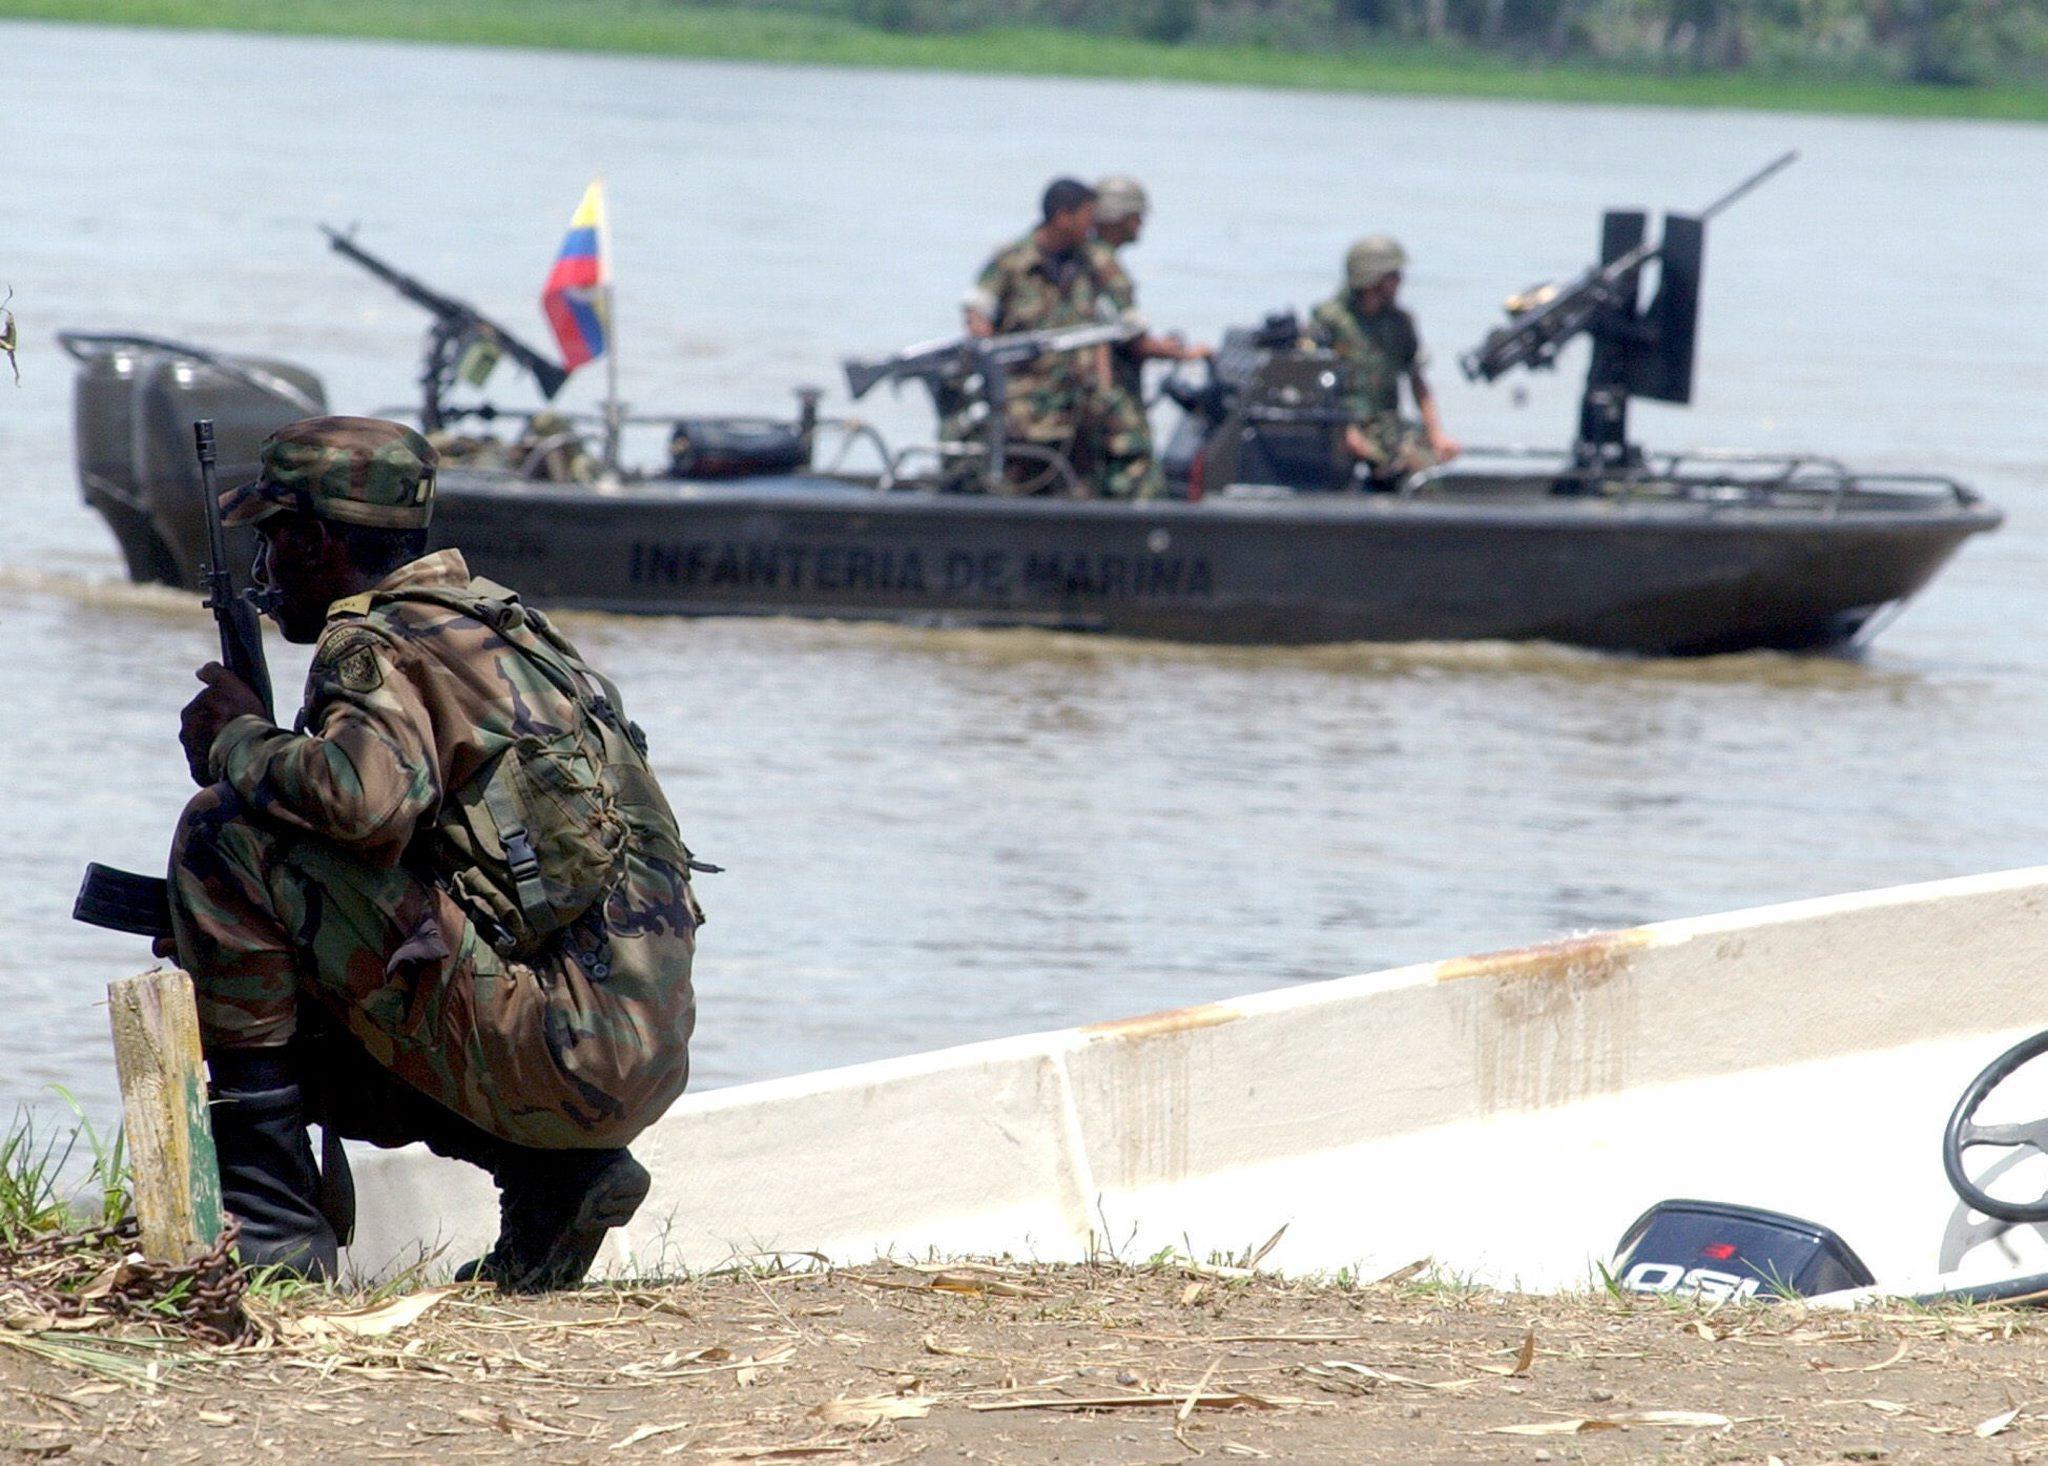 Colombian policemen patrol the Atrato River in Bojaya's jungle village of Choco Department